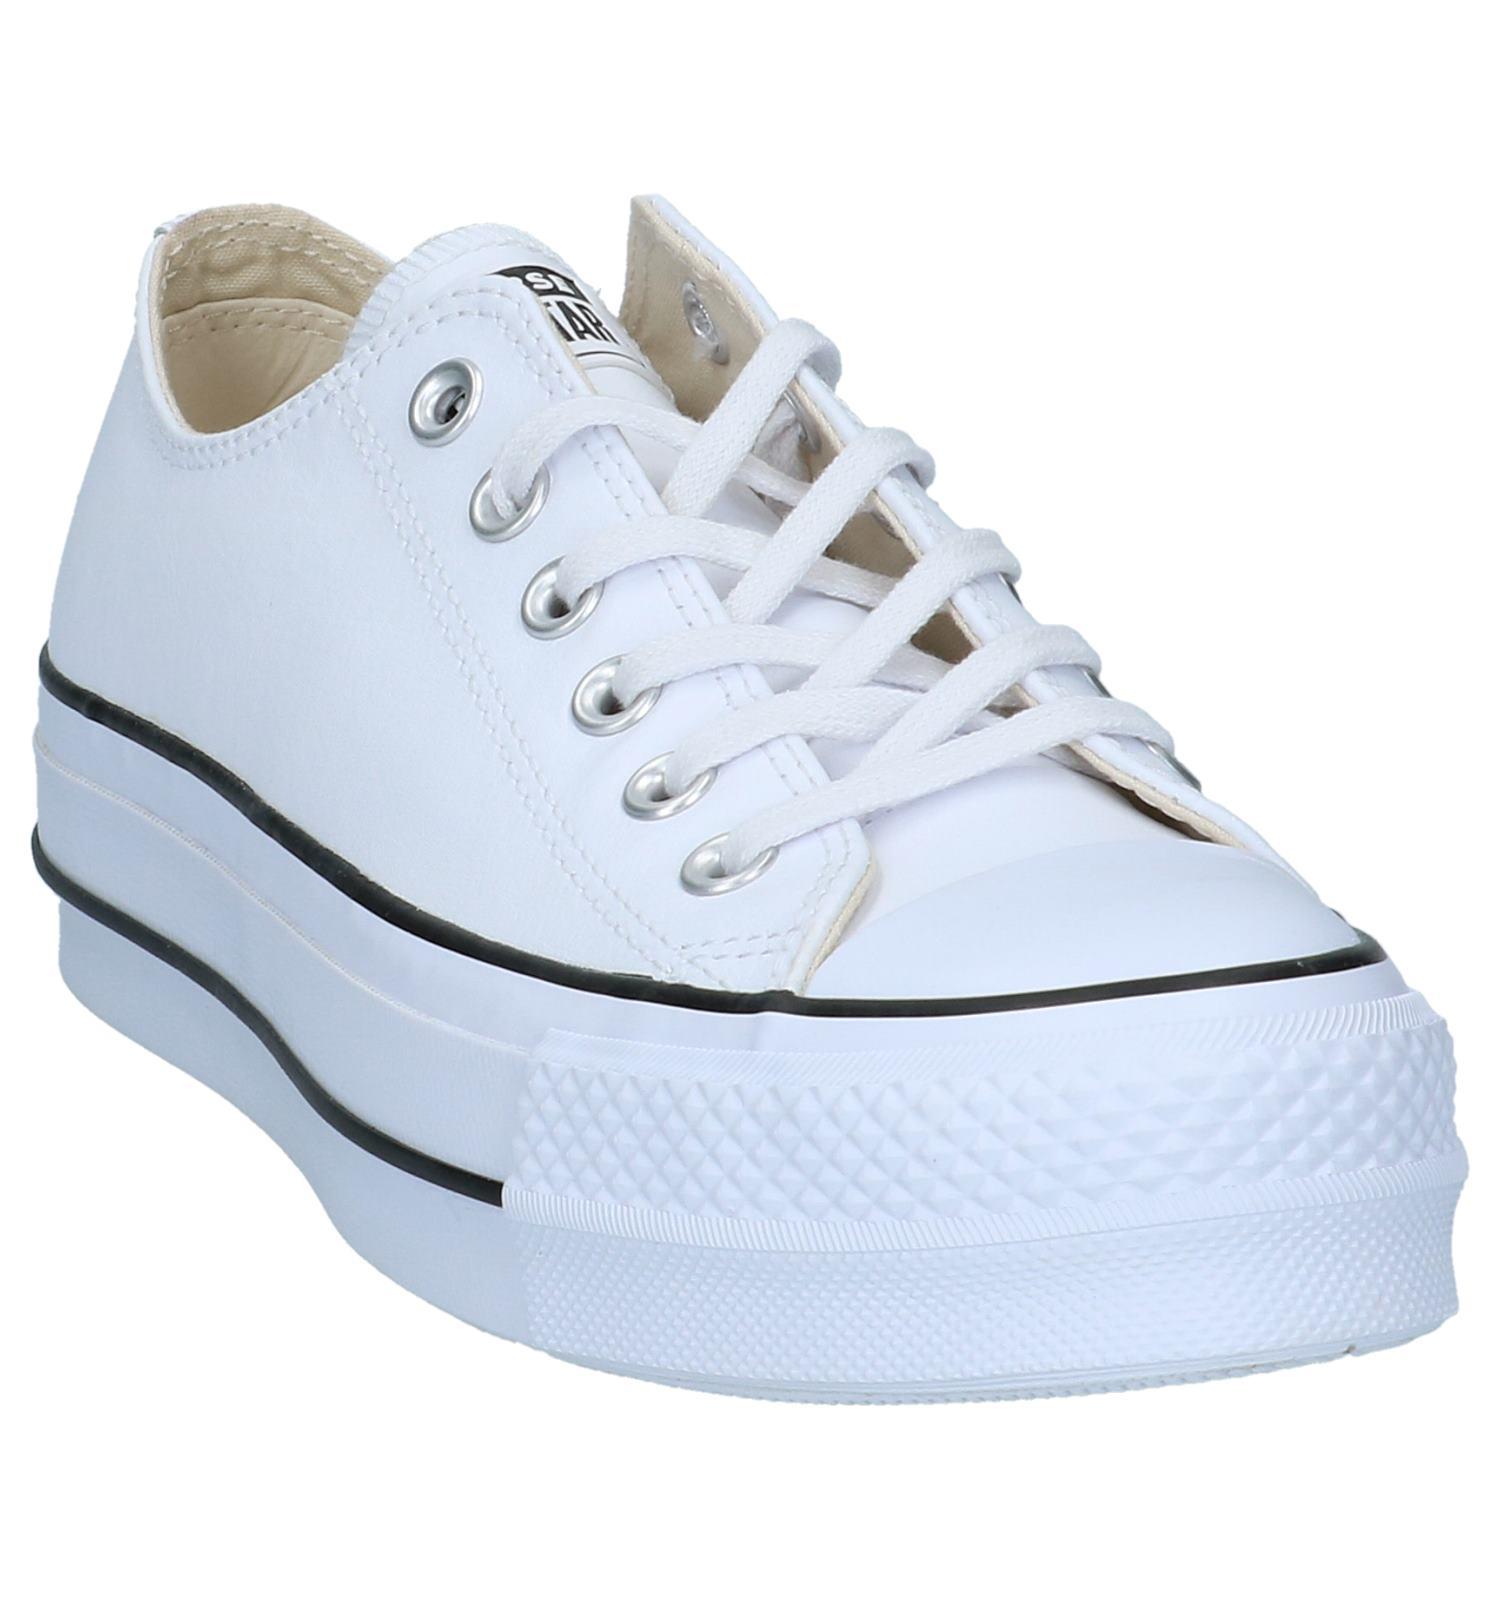 44769a4203a Witte Lage Geklede Sneakers Converse Chuck Taylor All Stars | TORFS.BE |  Gratis verzend en retour